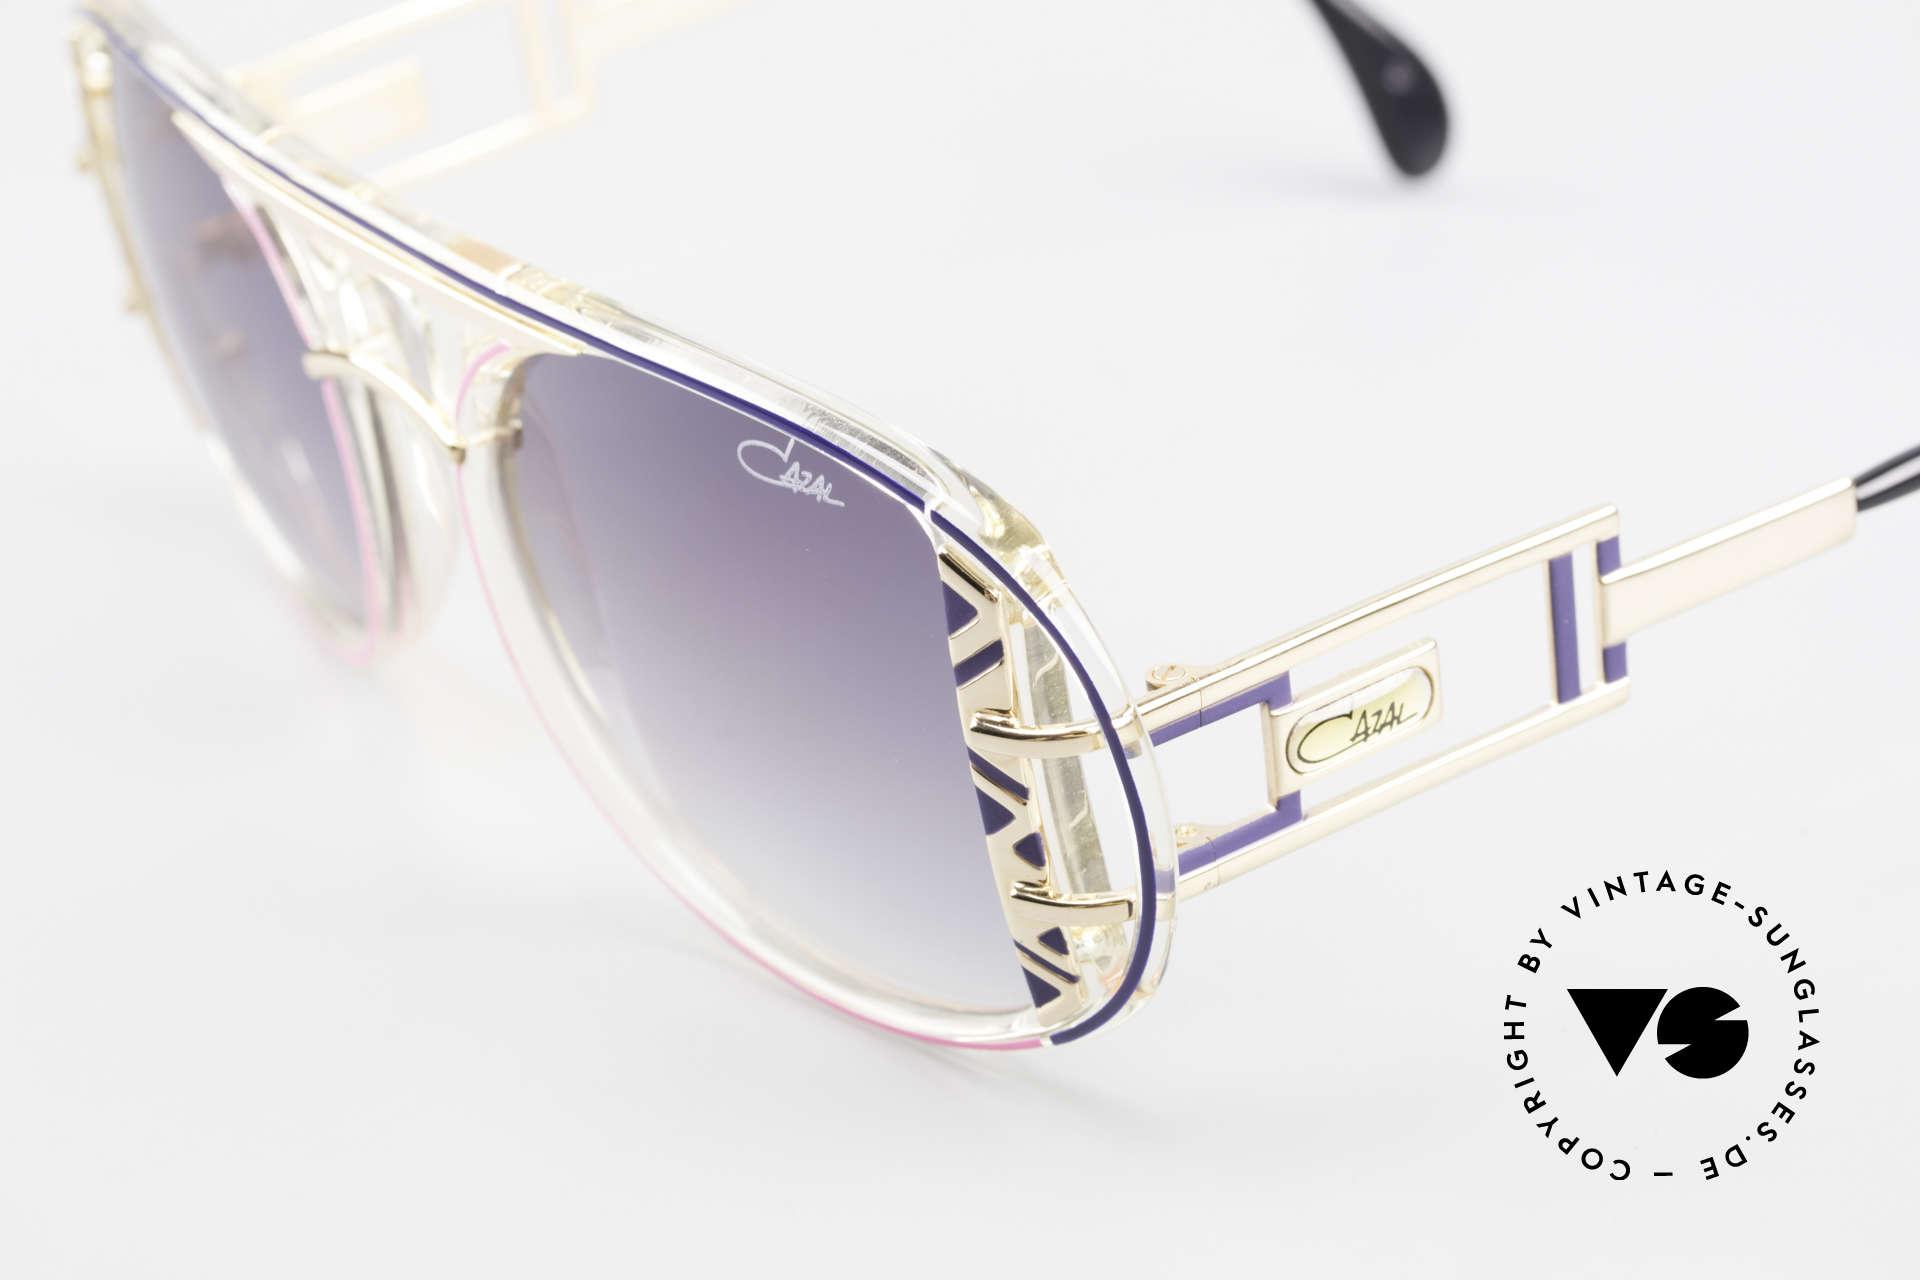 Cazal 875 Rare 90's Designer Sunglasses, a true eye-catcher (made for ladies & gentlemen), Made for Men and Women